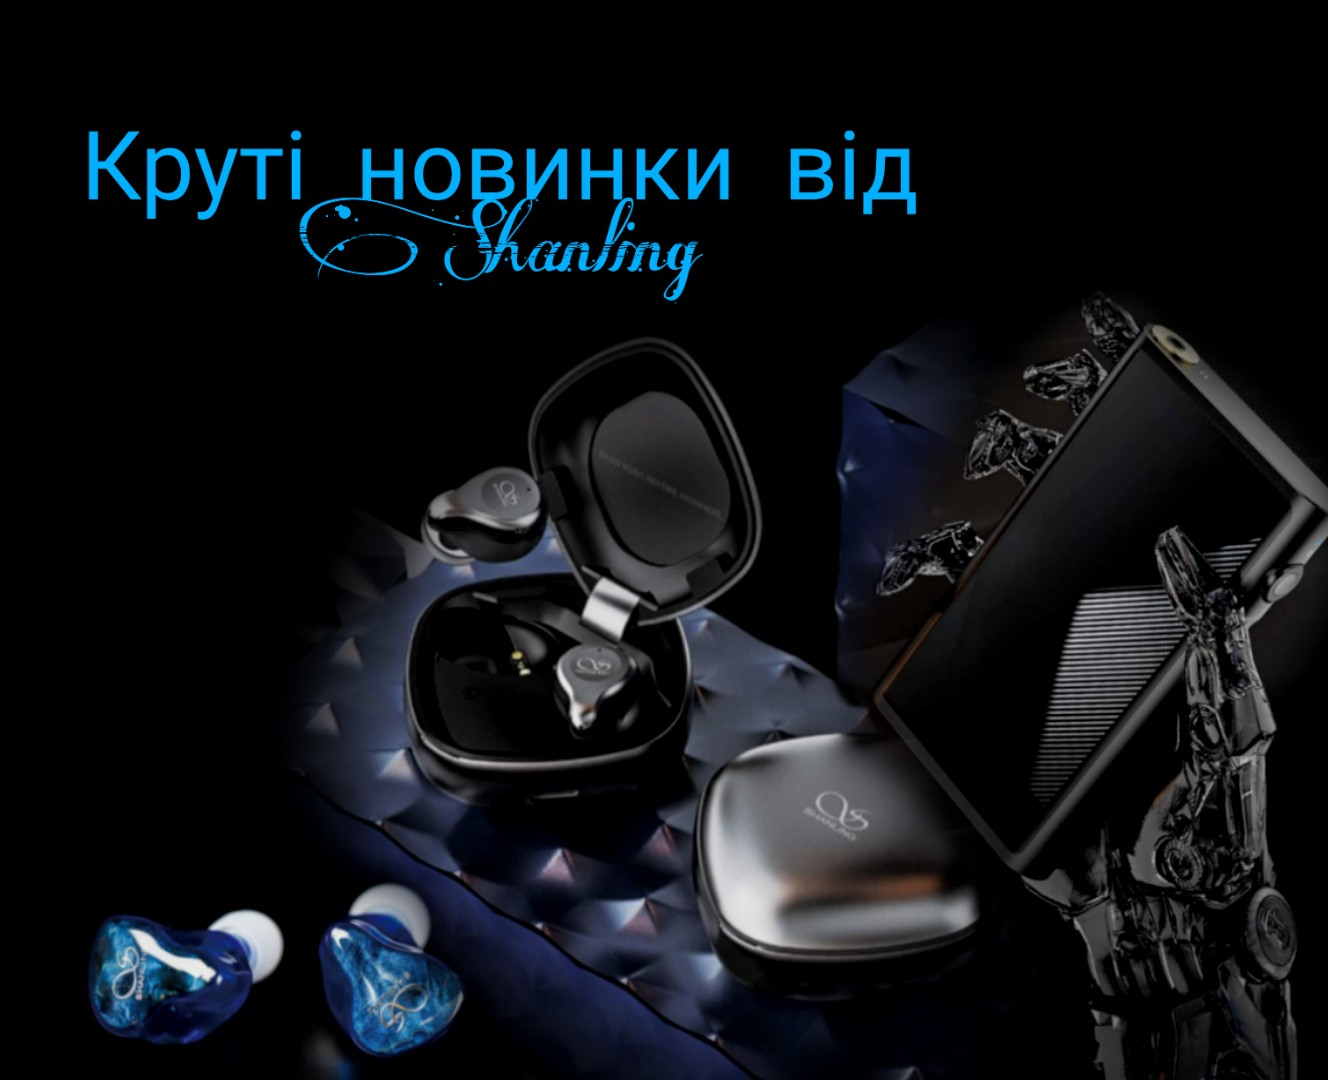 news poster